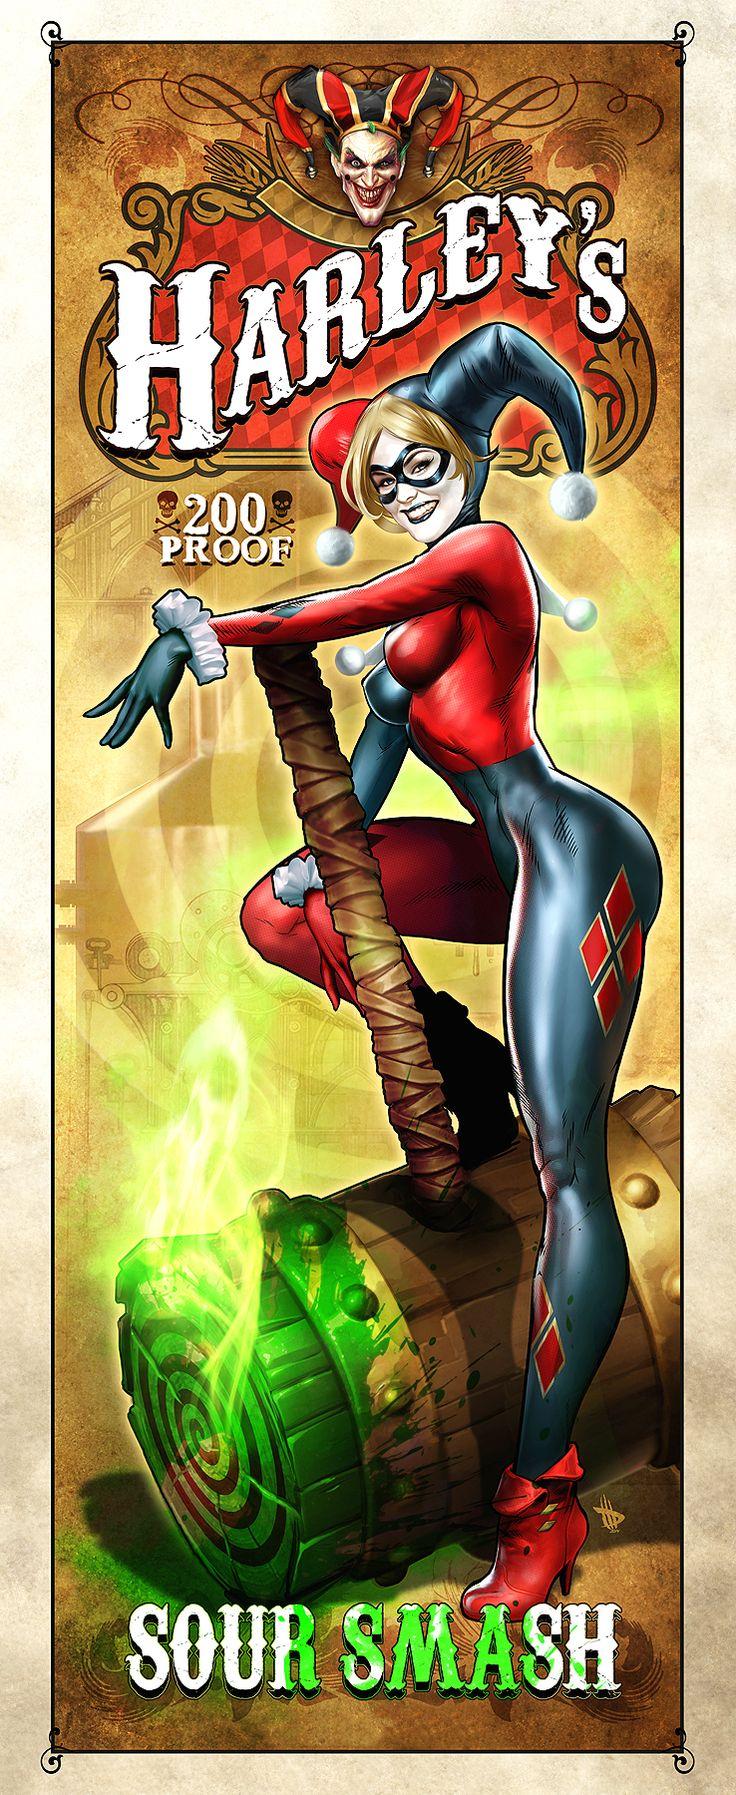 Galeria de Arte (5): Marvel e DC - Página 3 17c9ec1417fd53ada0ba7a2898909627